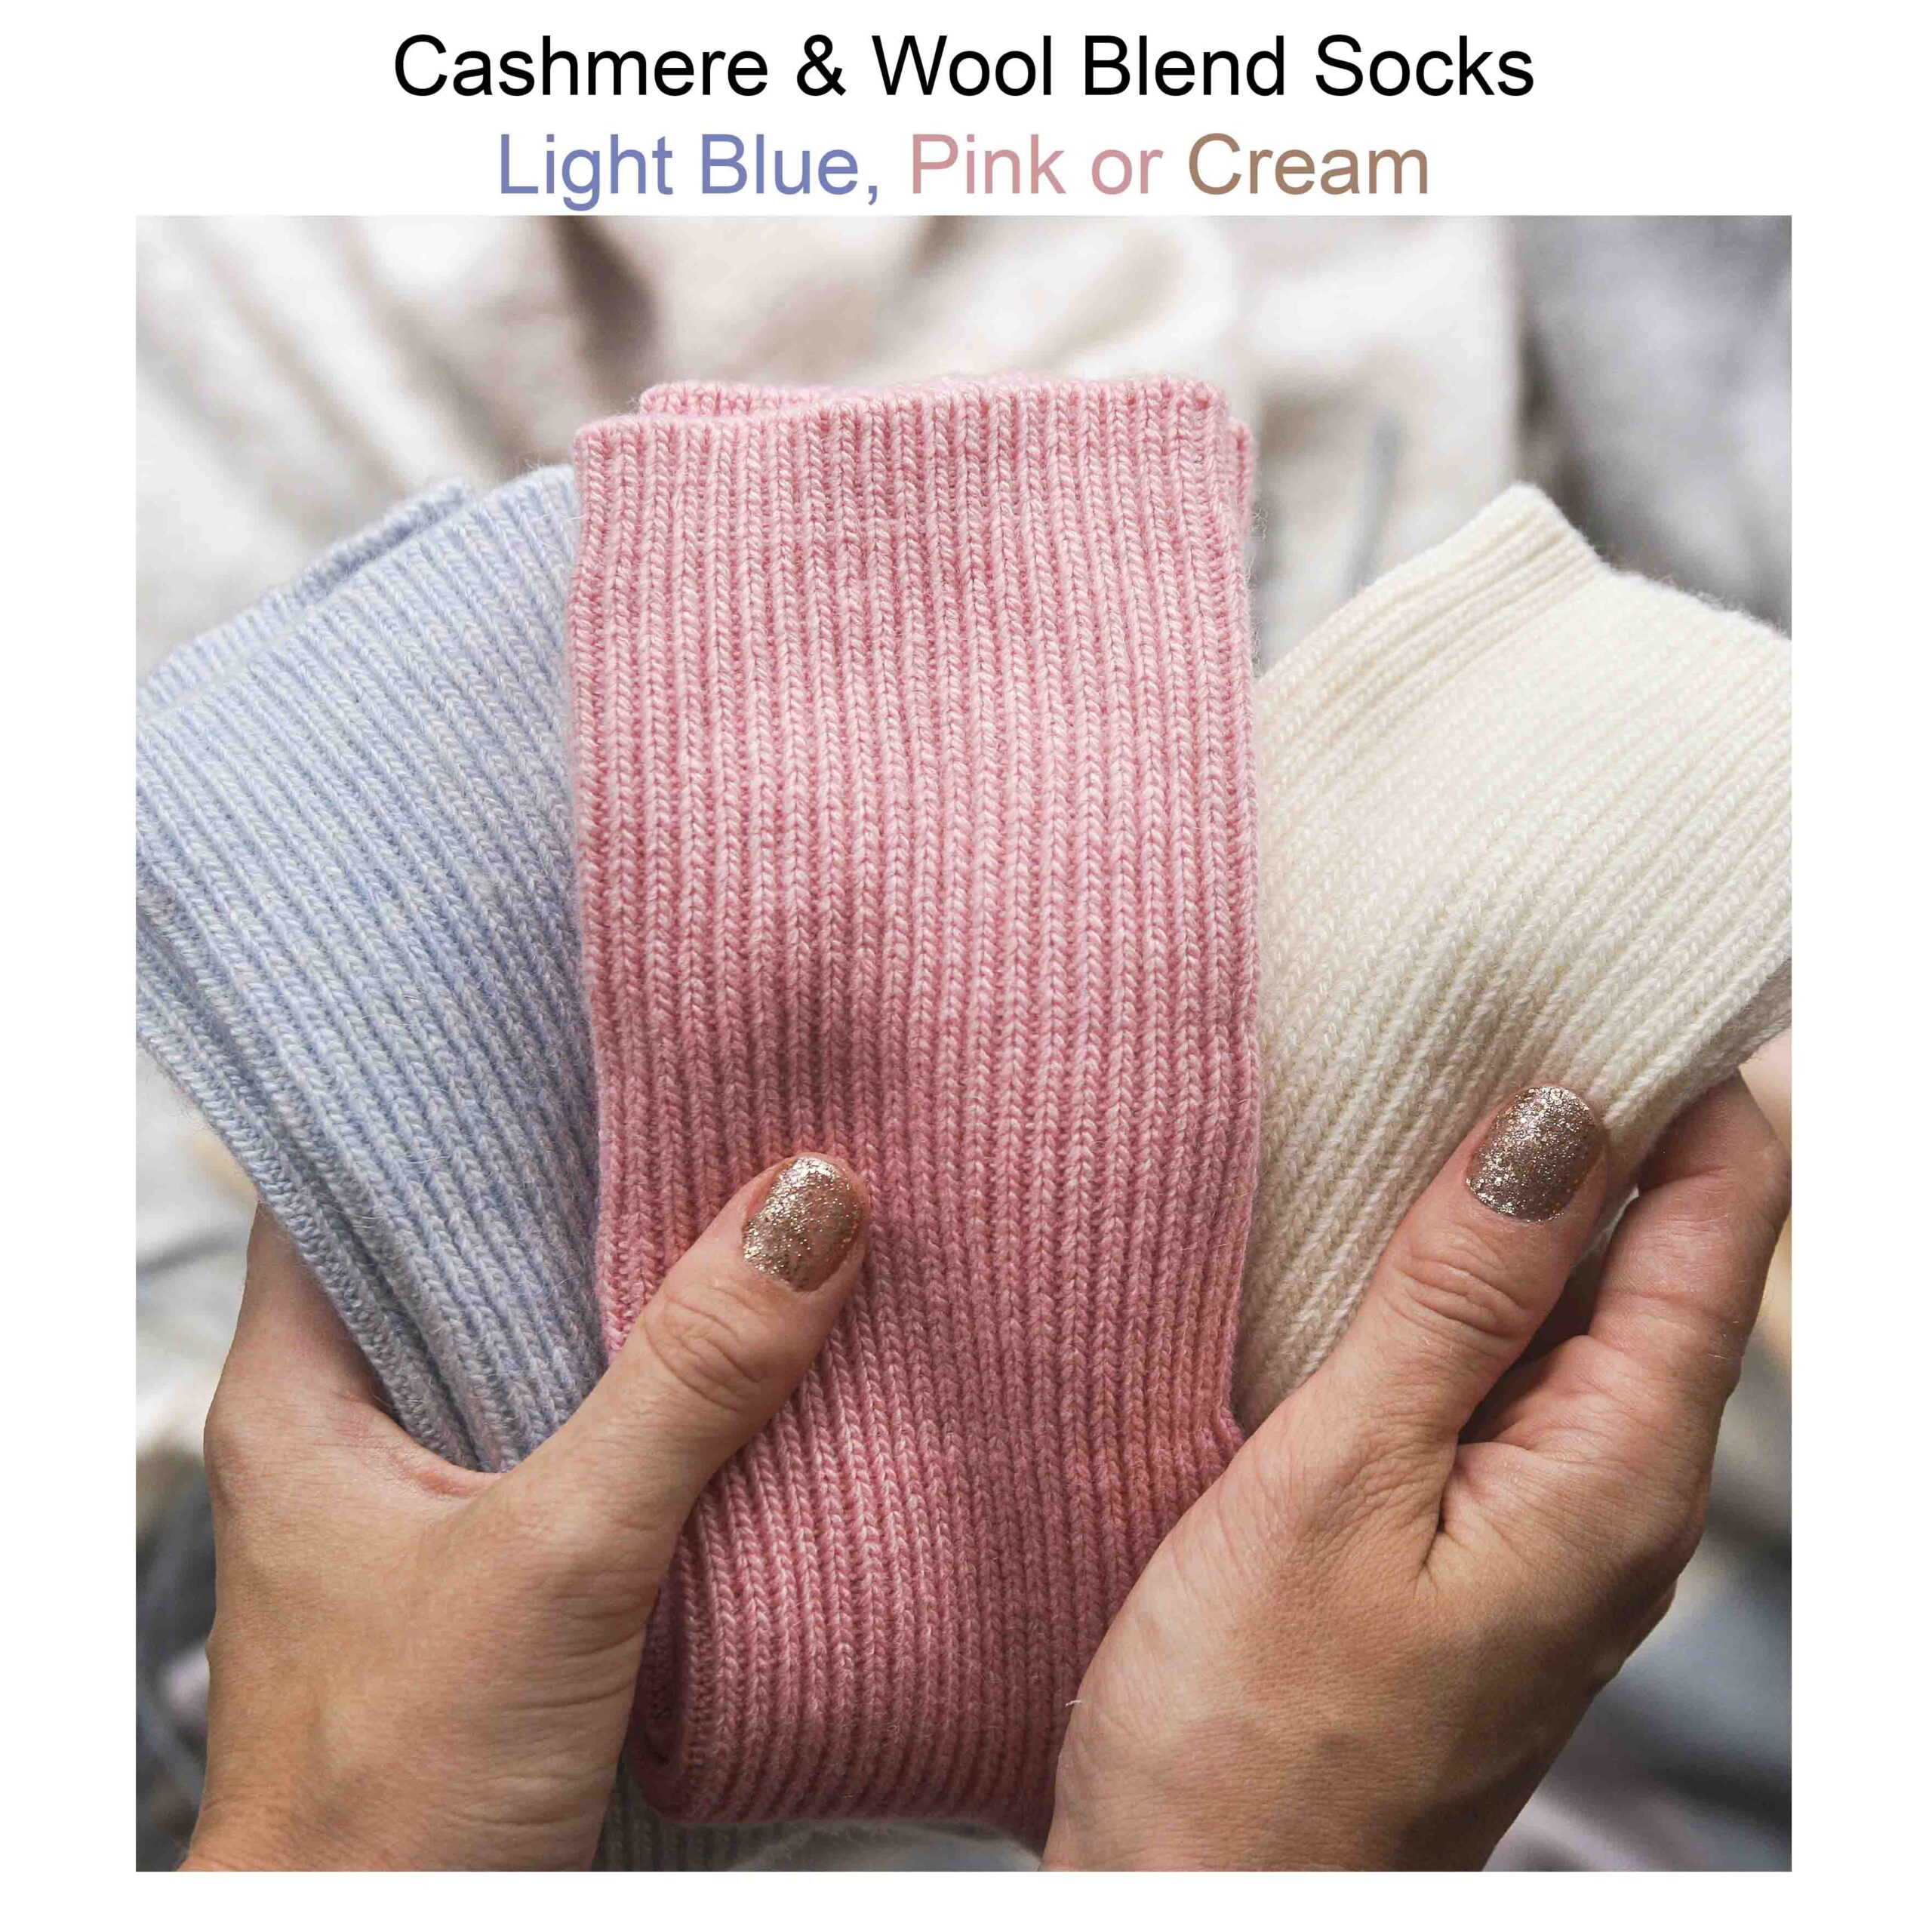 Personalised cashmere socks